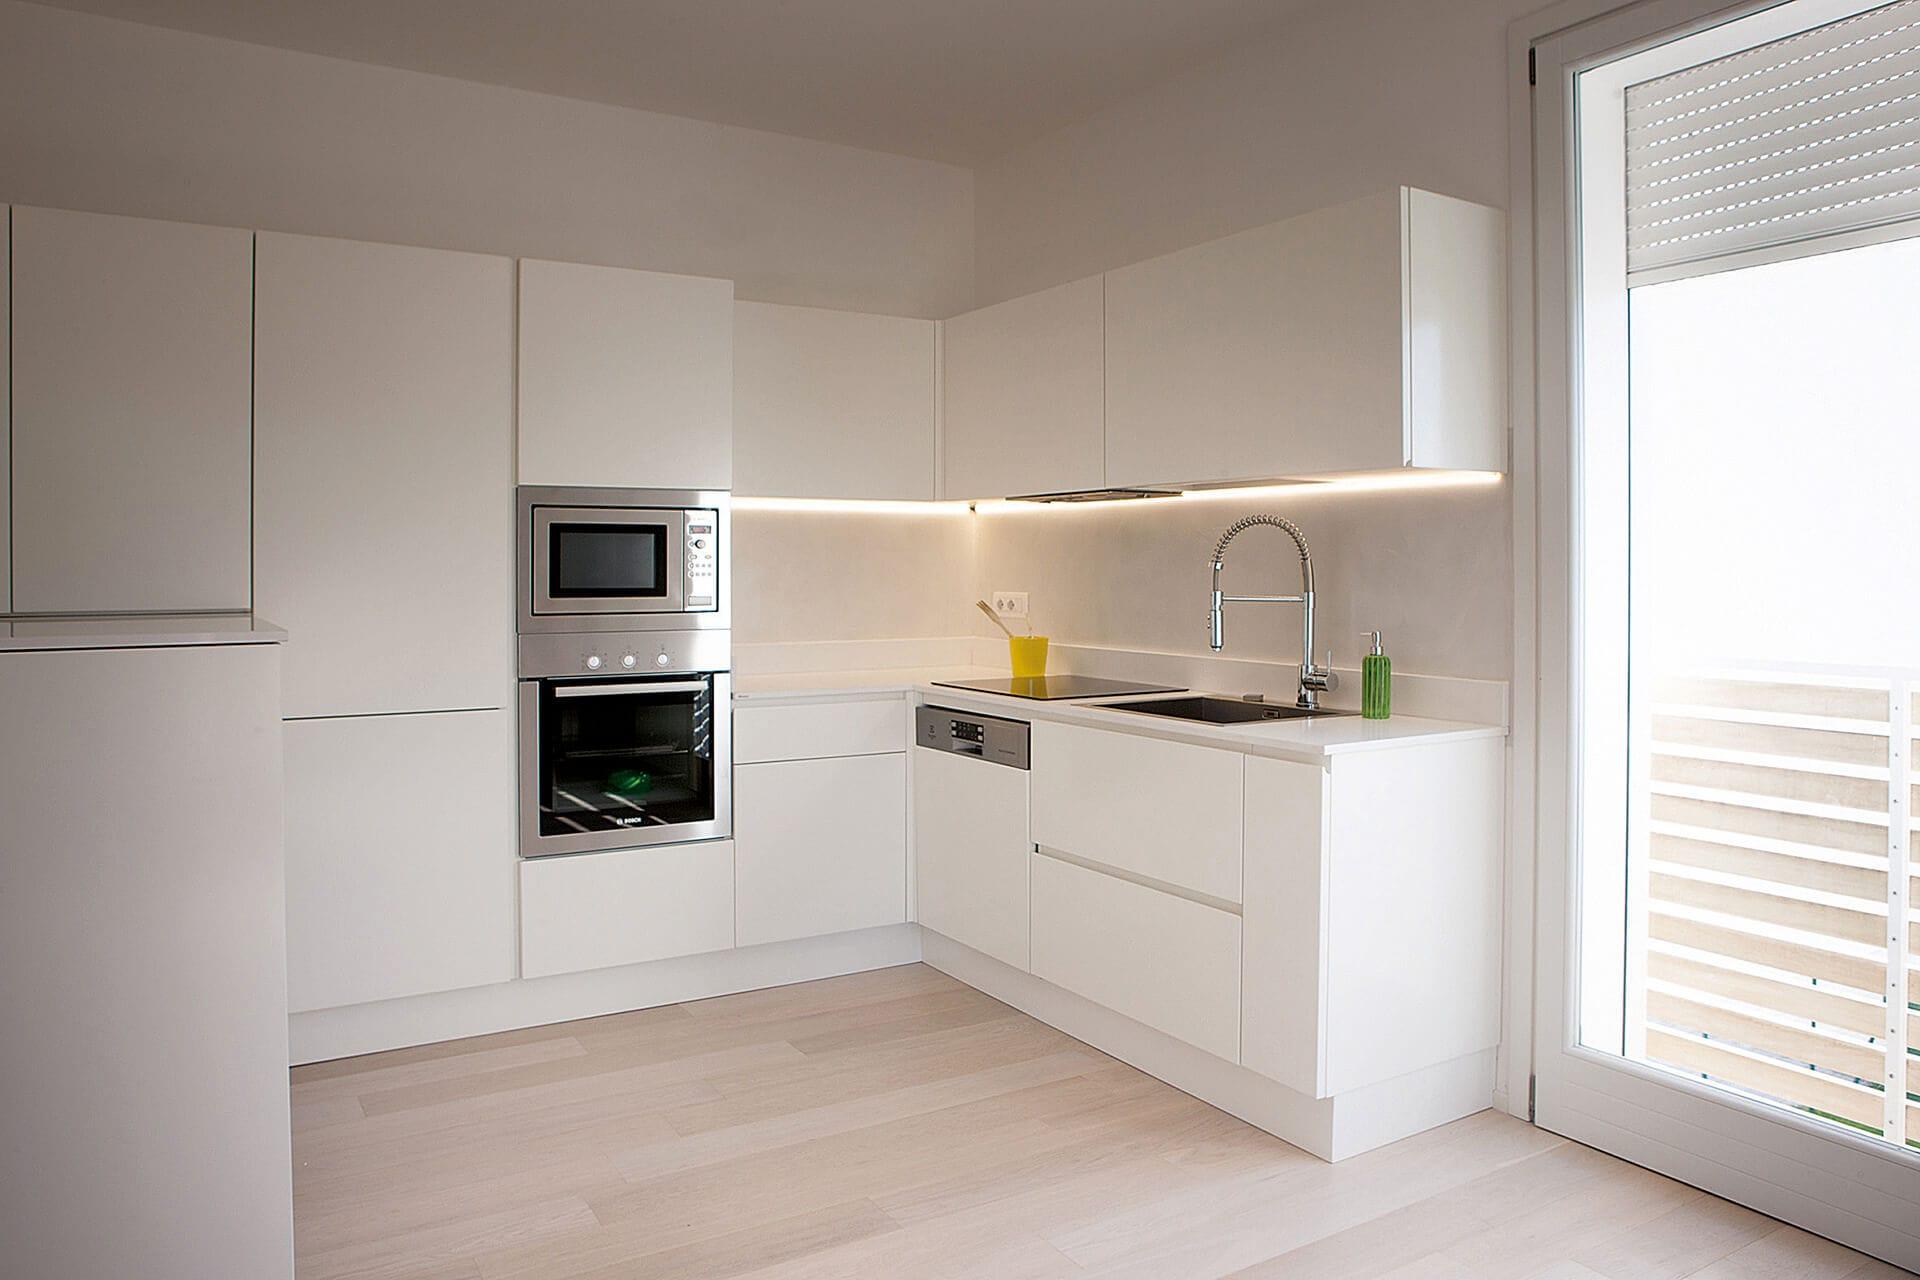 Rivestimento cucina in resina, pareti in resina - Resingroup